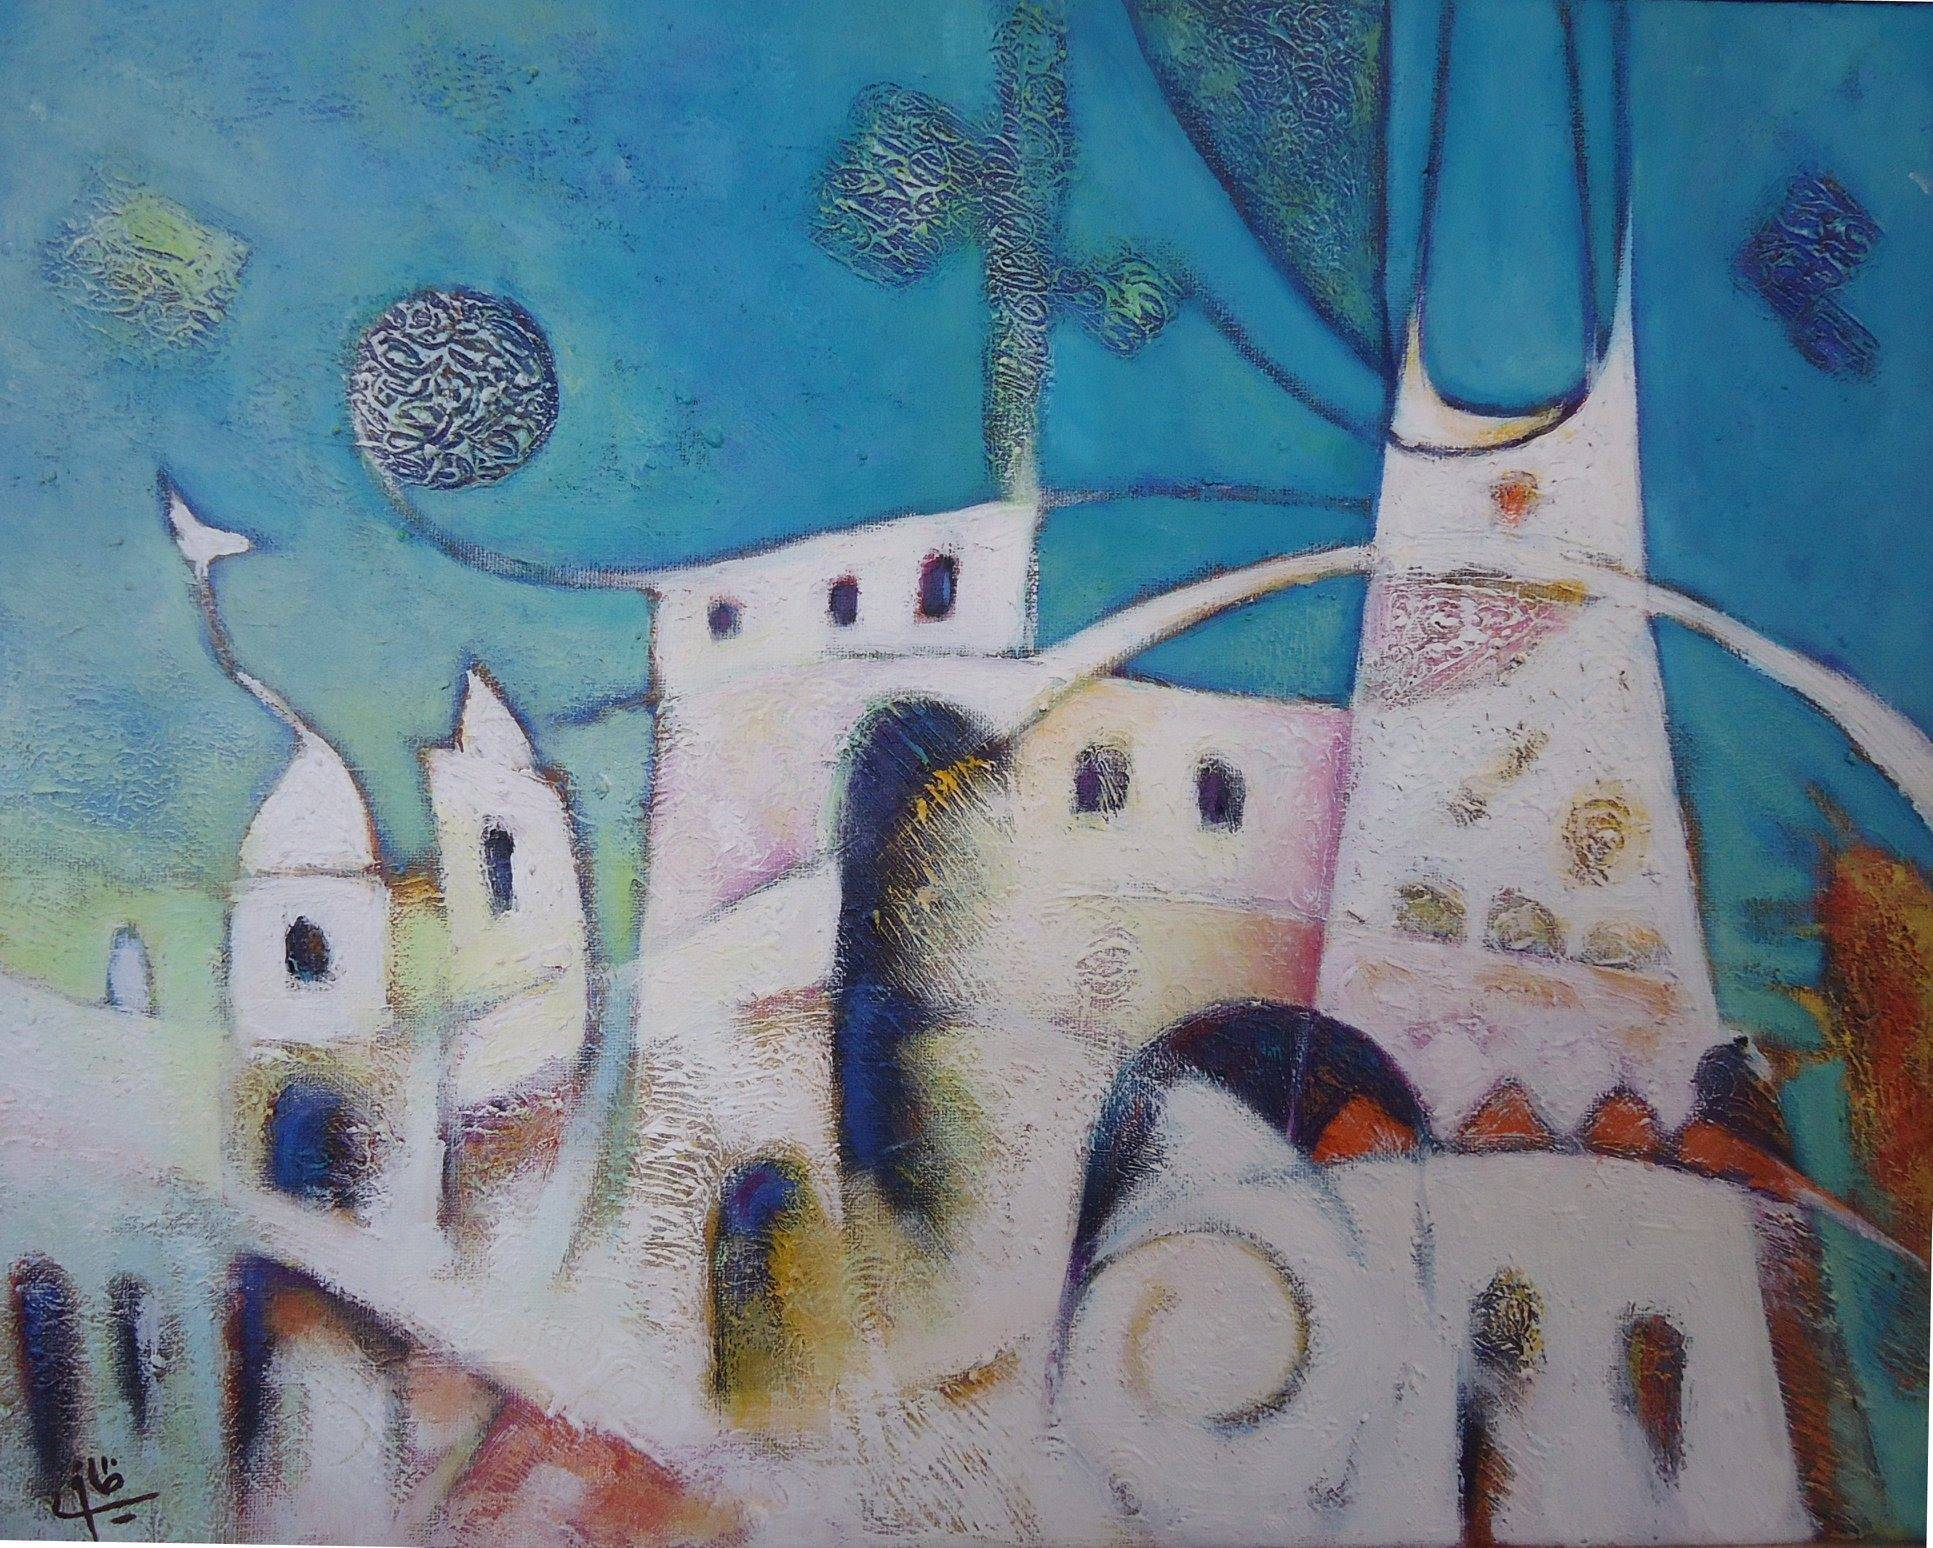 Ghardaia * city of mirage